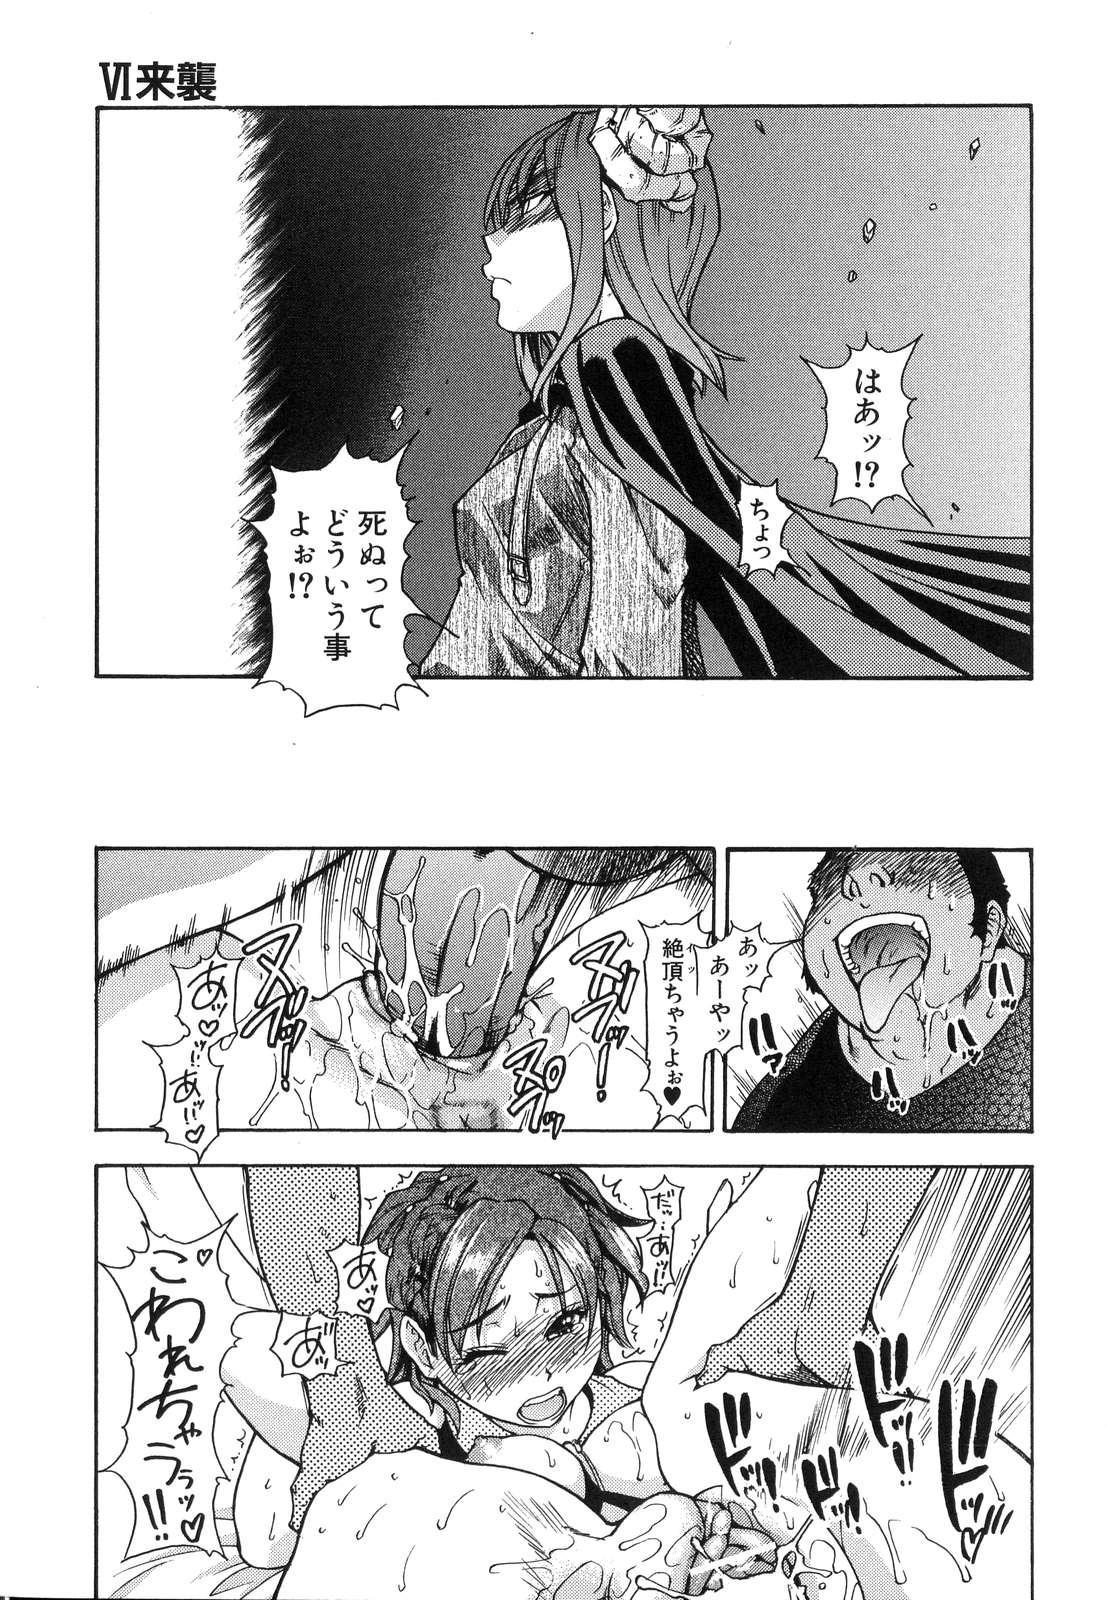 Shining Musume. 6. Rainbow Six 55